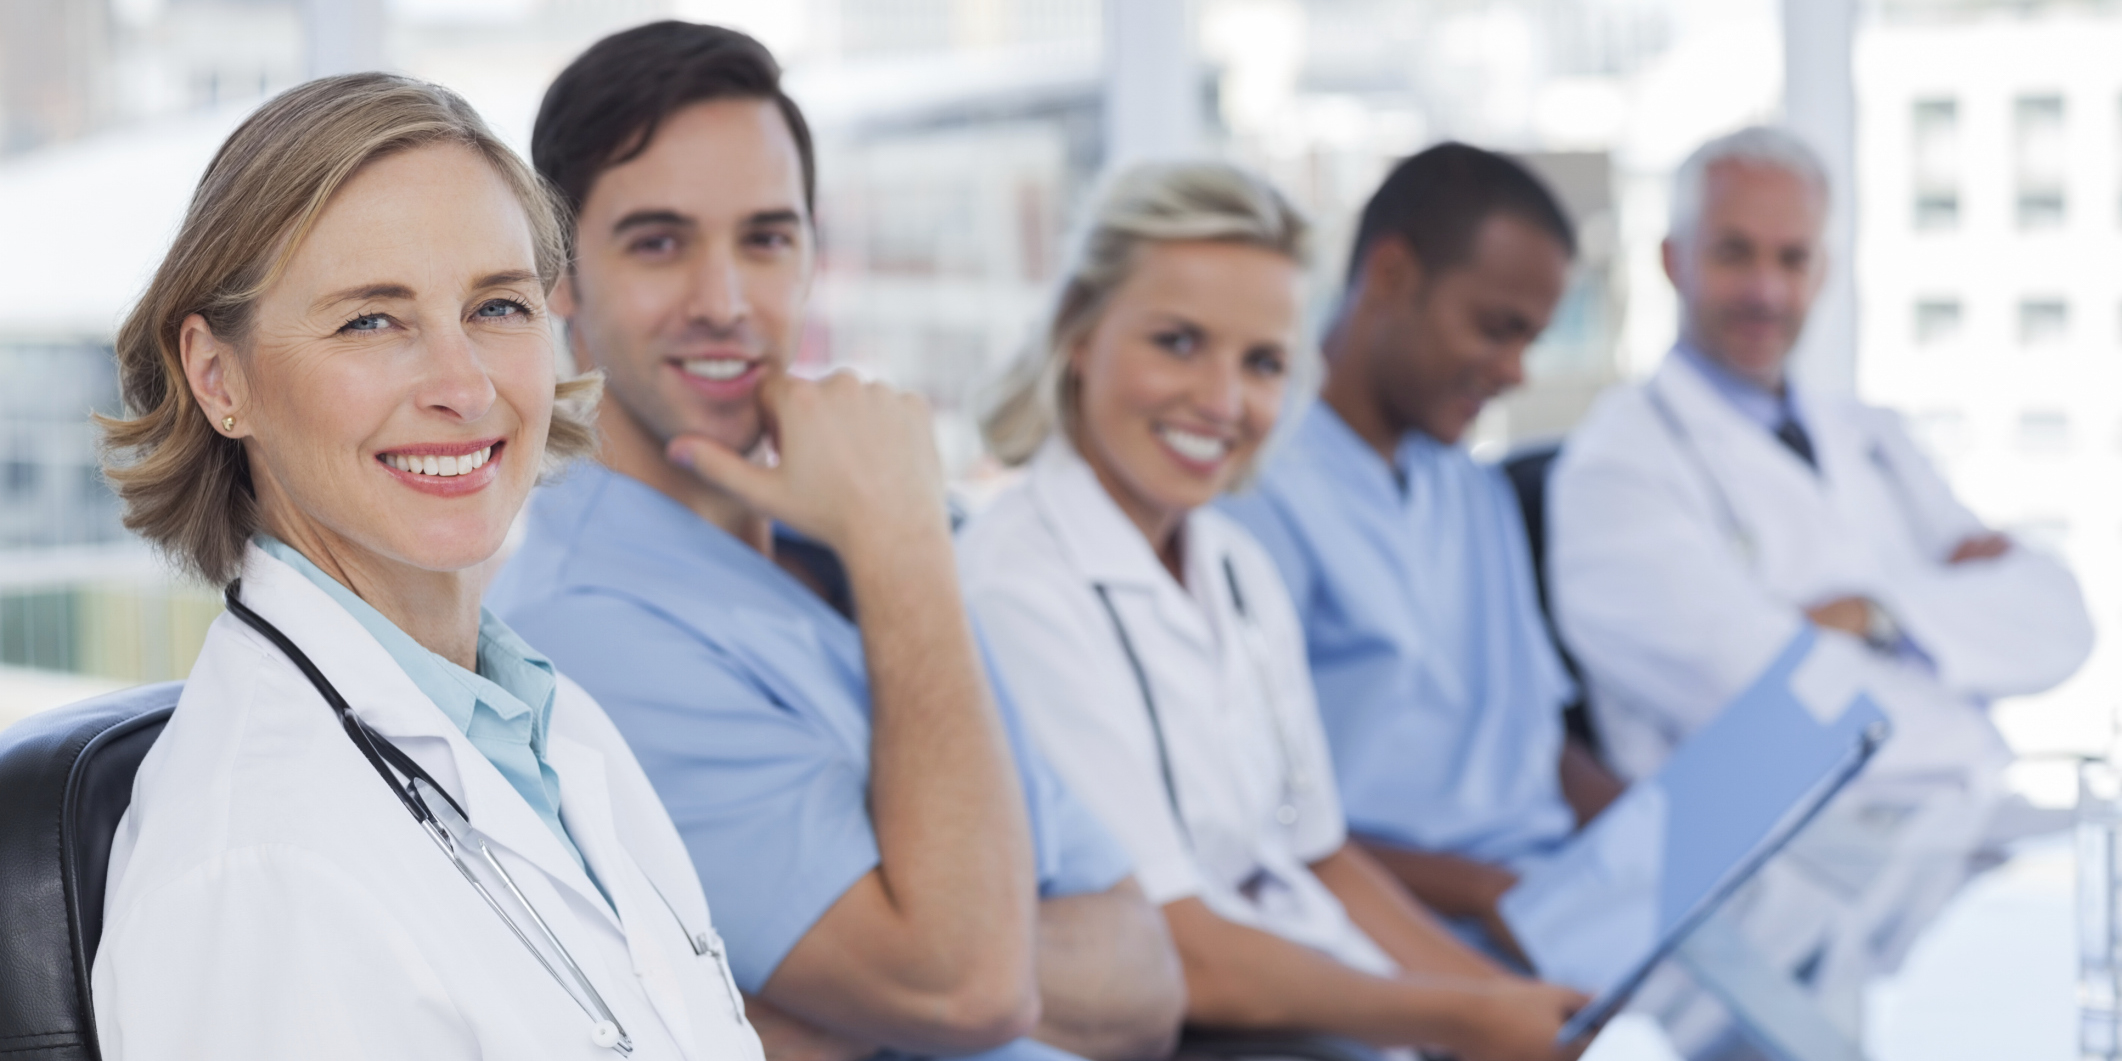 Residency Program at Orlando Health